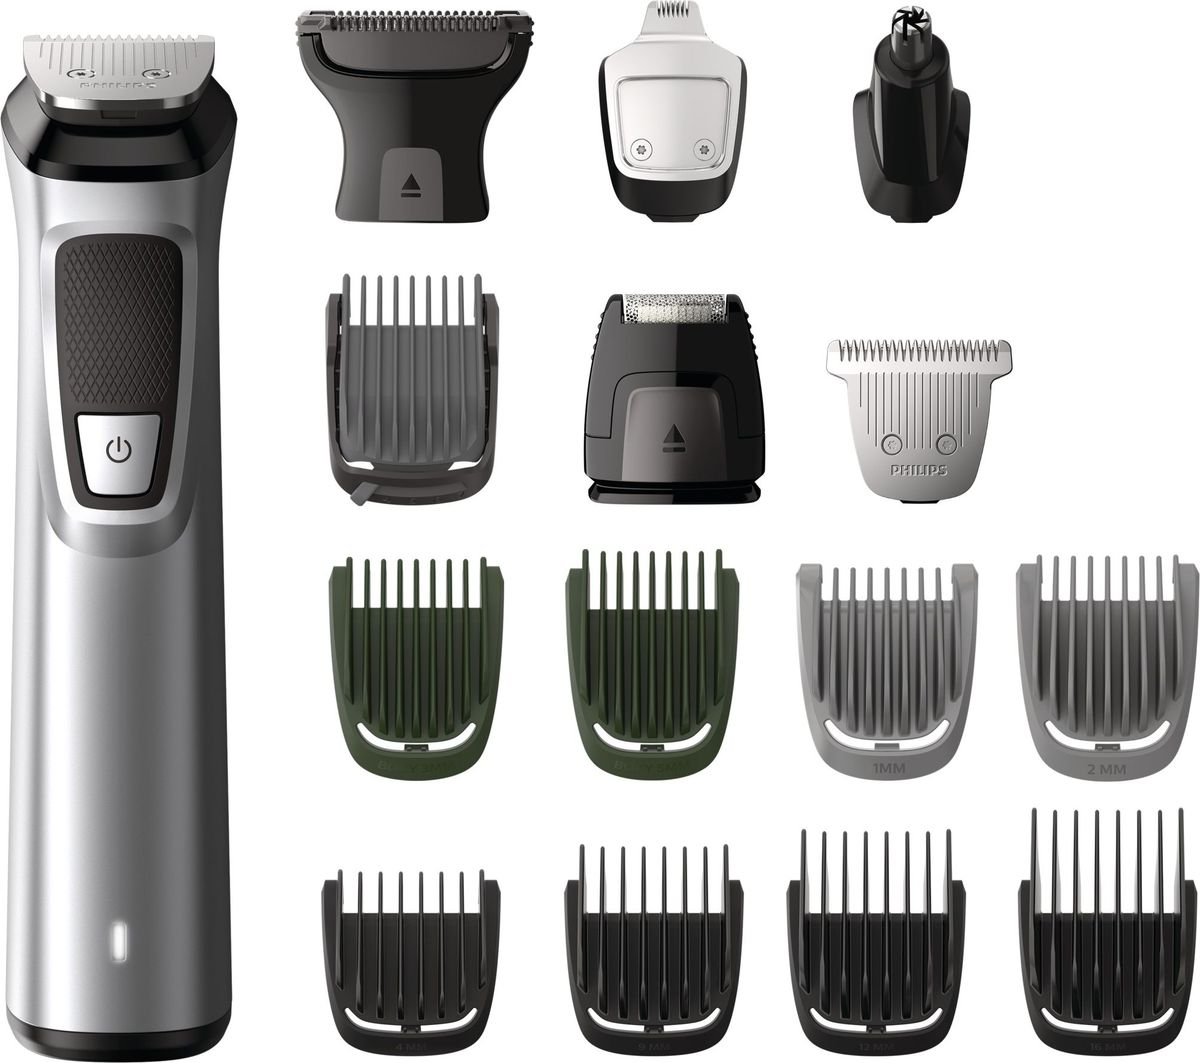 Philips MG7730/15 триммер 16 в 1 для волос на голове, лице и теле